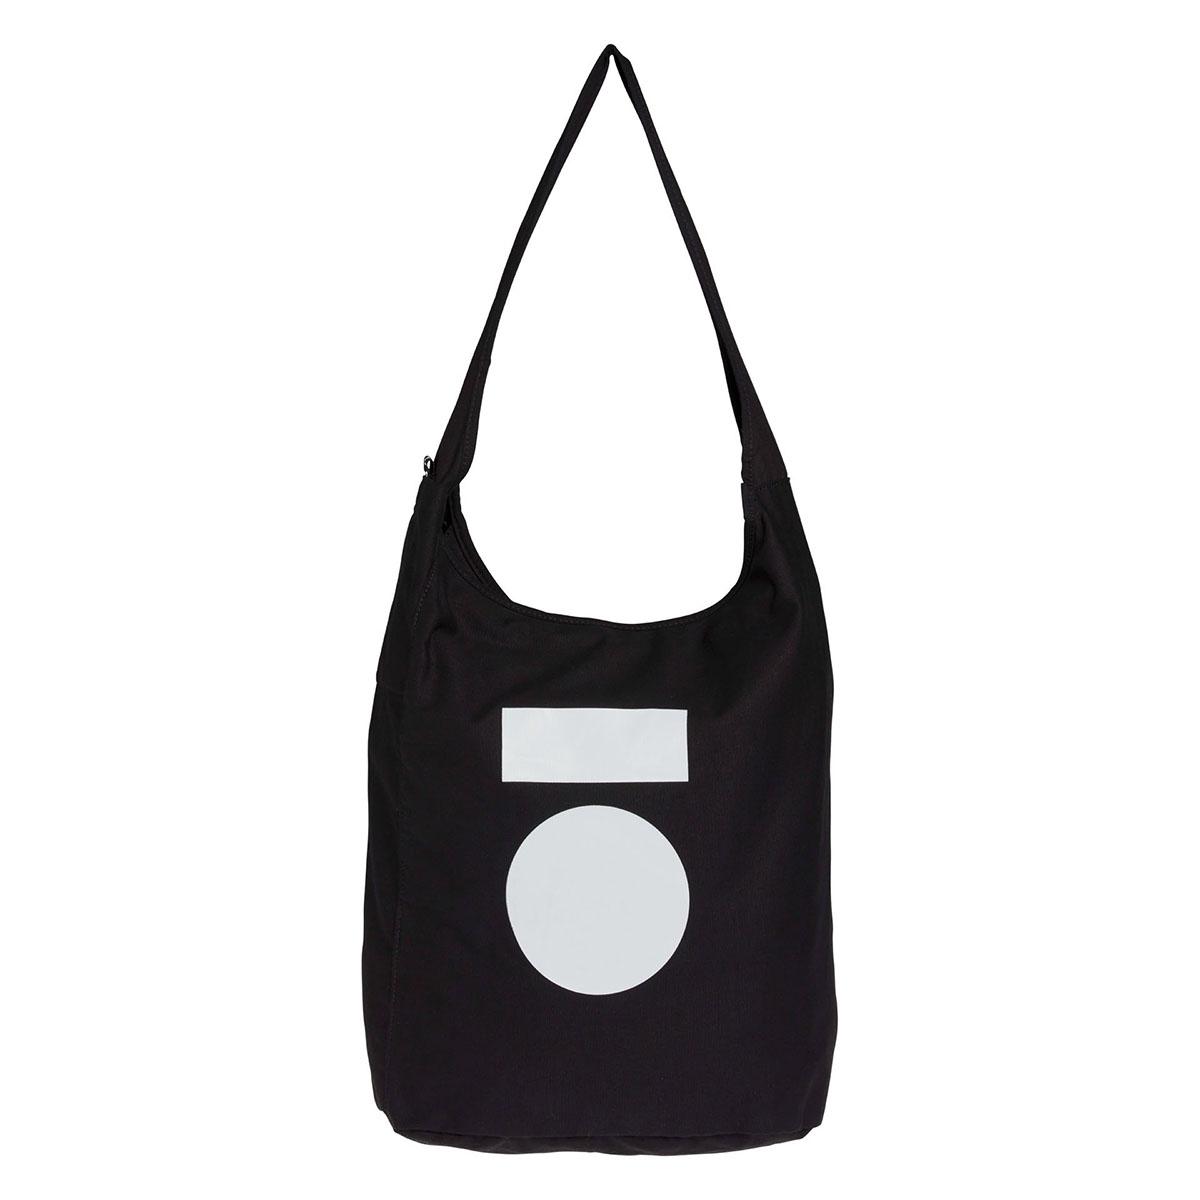 tote bag 20 959 9103 10 days tas black